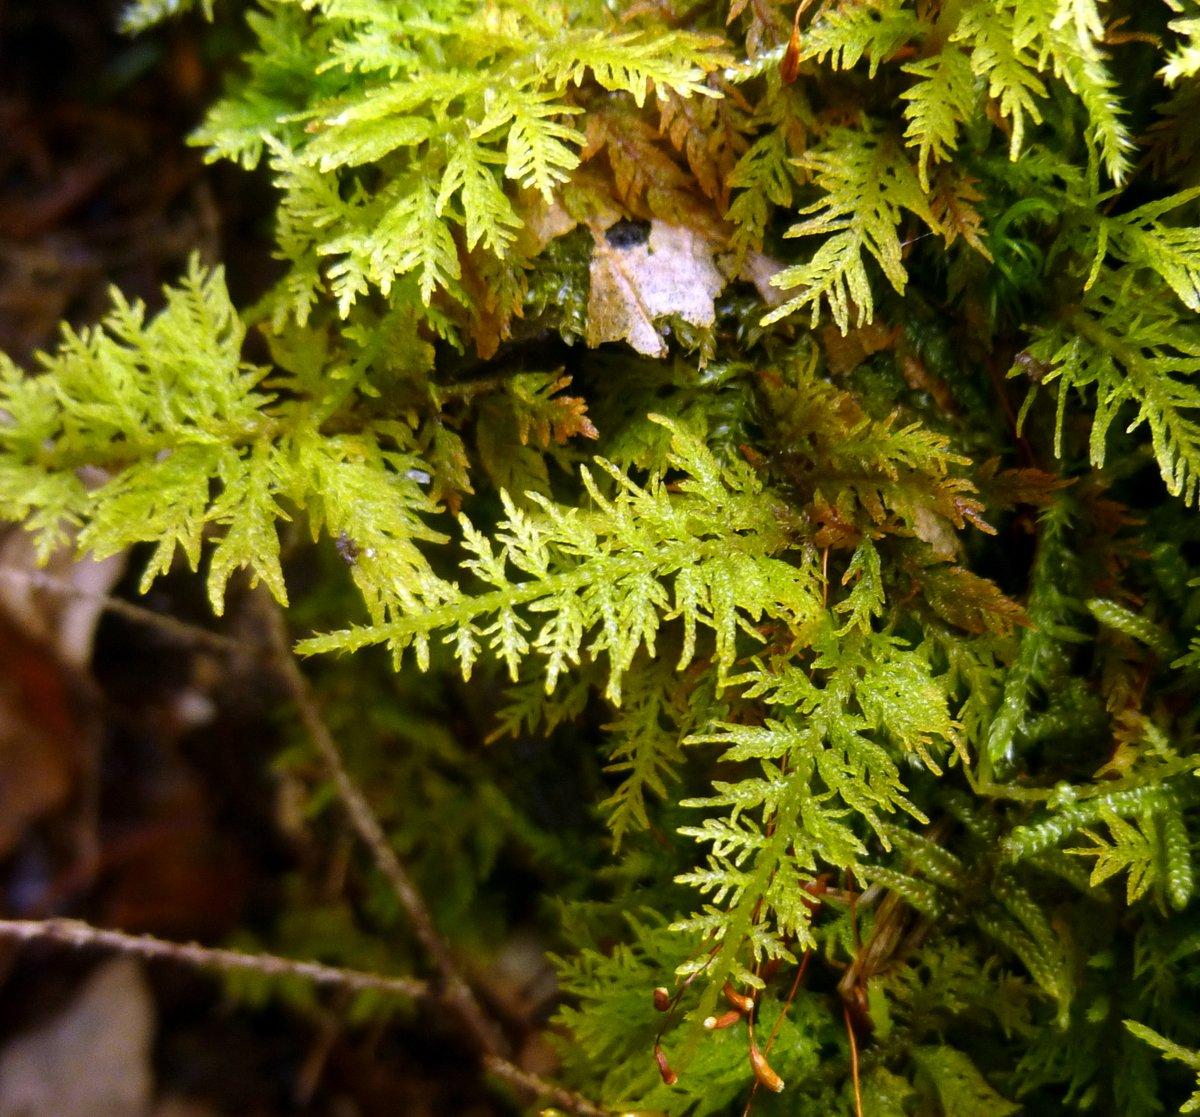 7. Delicate Fern Moss aka Thuidium delicatulum